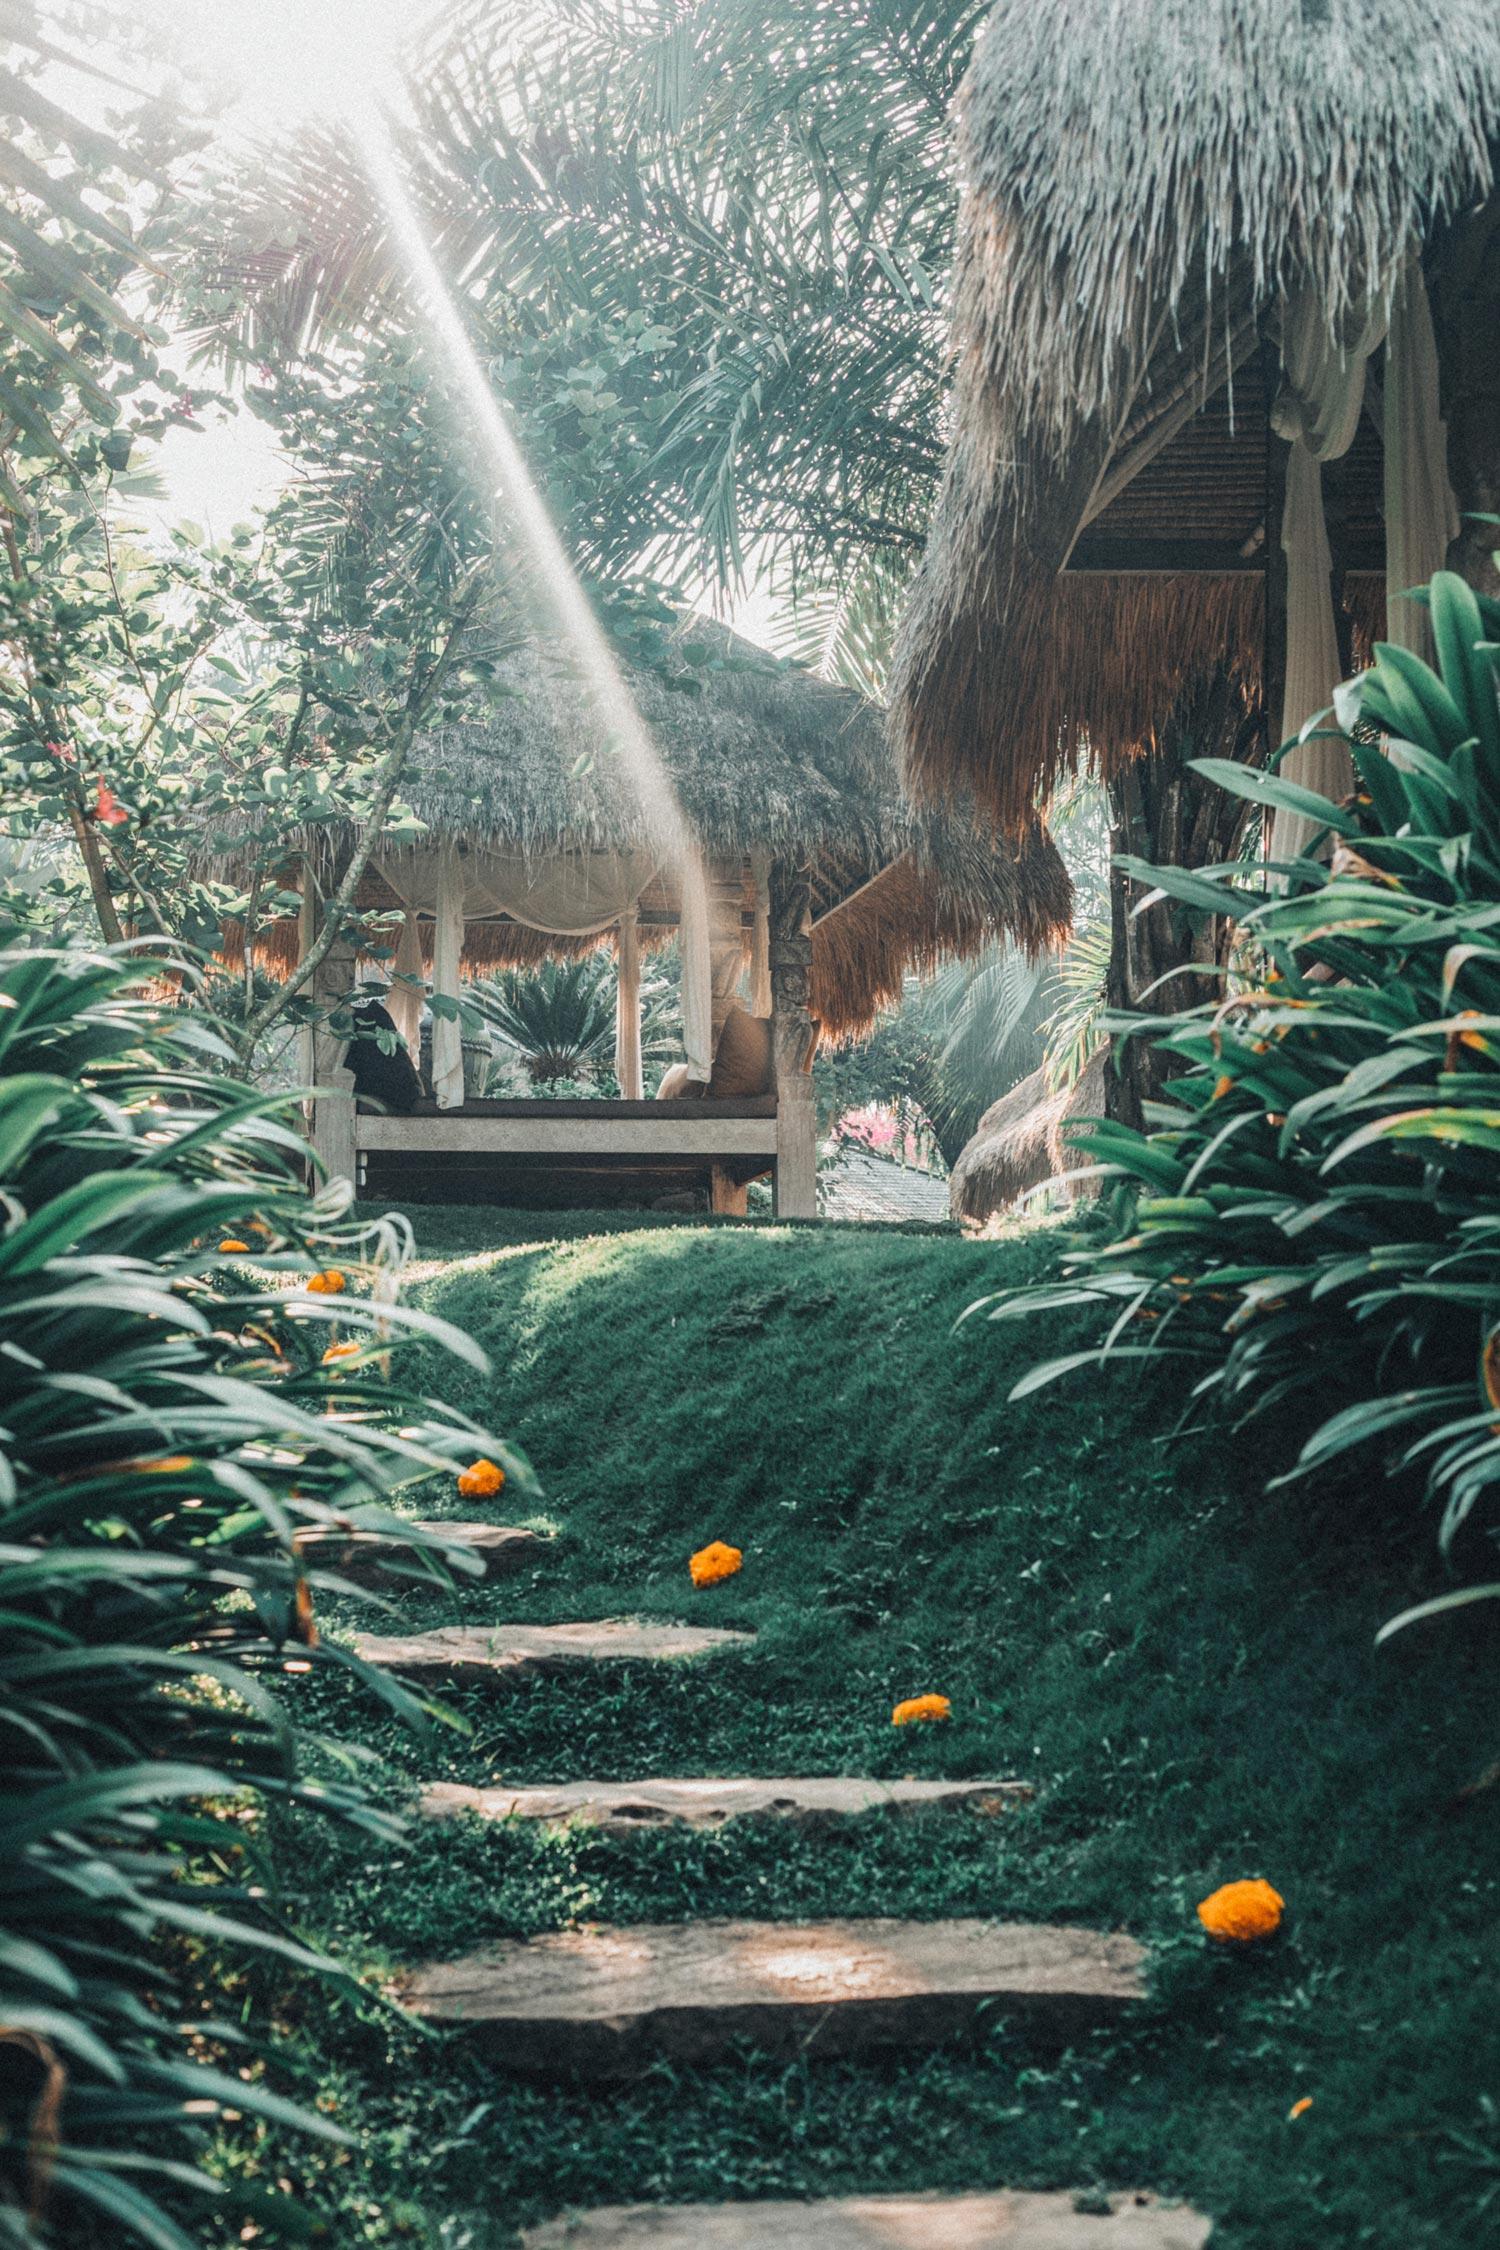 bali-indonesia-yoga-retreat-travel-photography-11.jpg